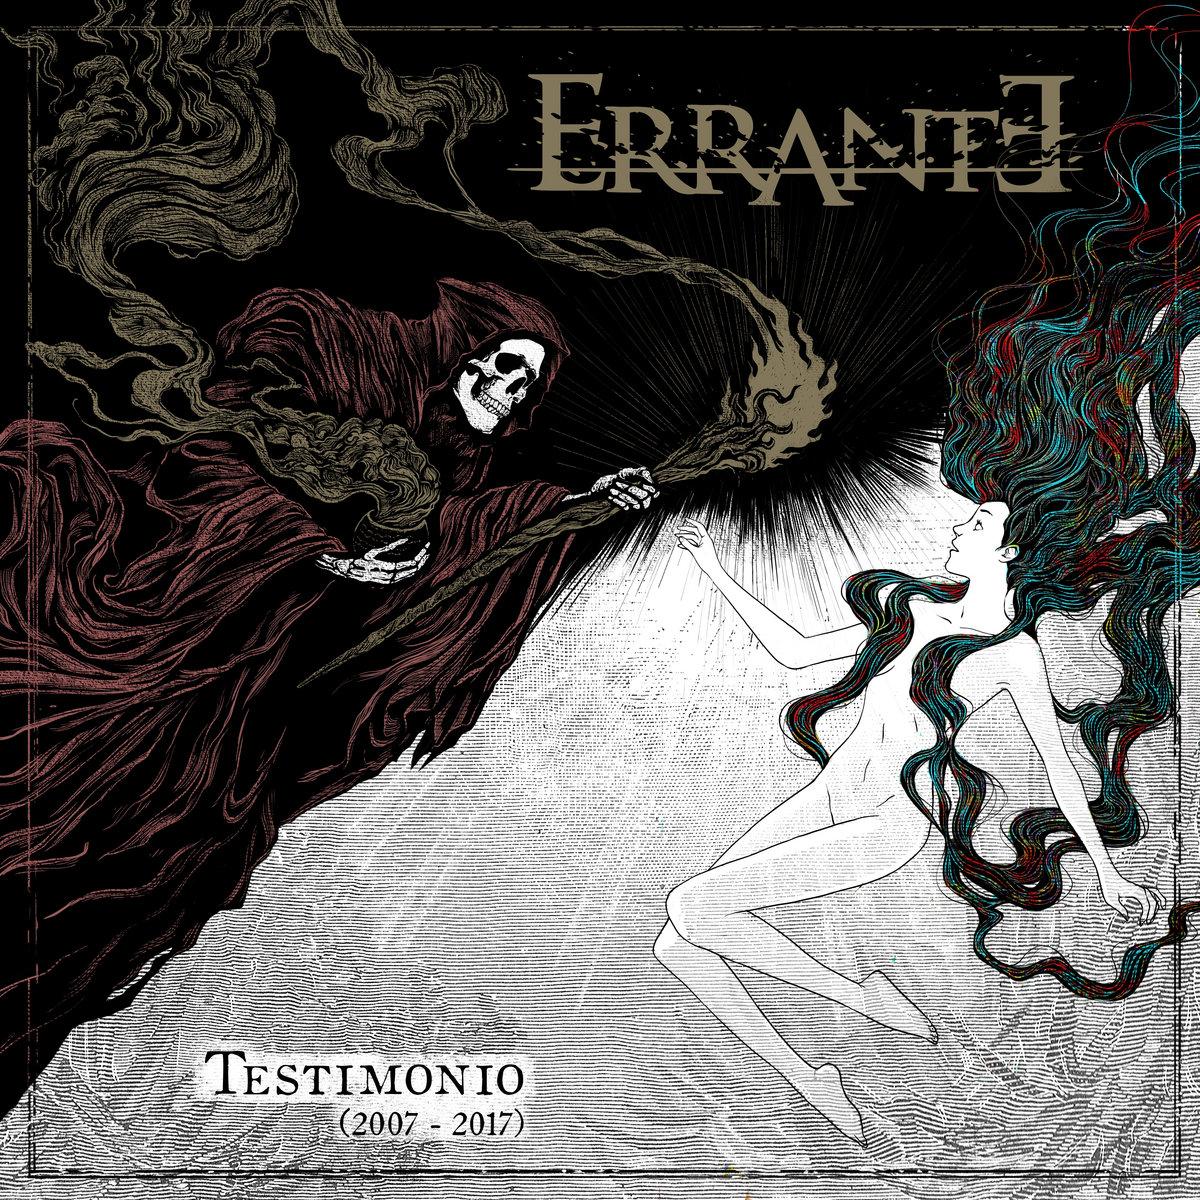 Testimonio (2007-2017)(2018) | Errante